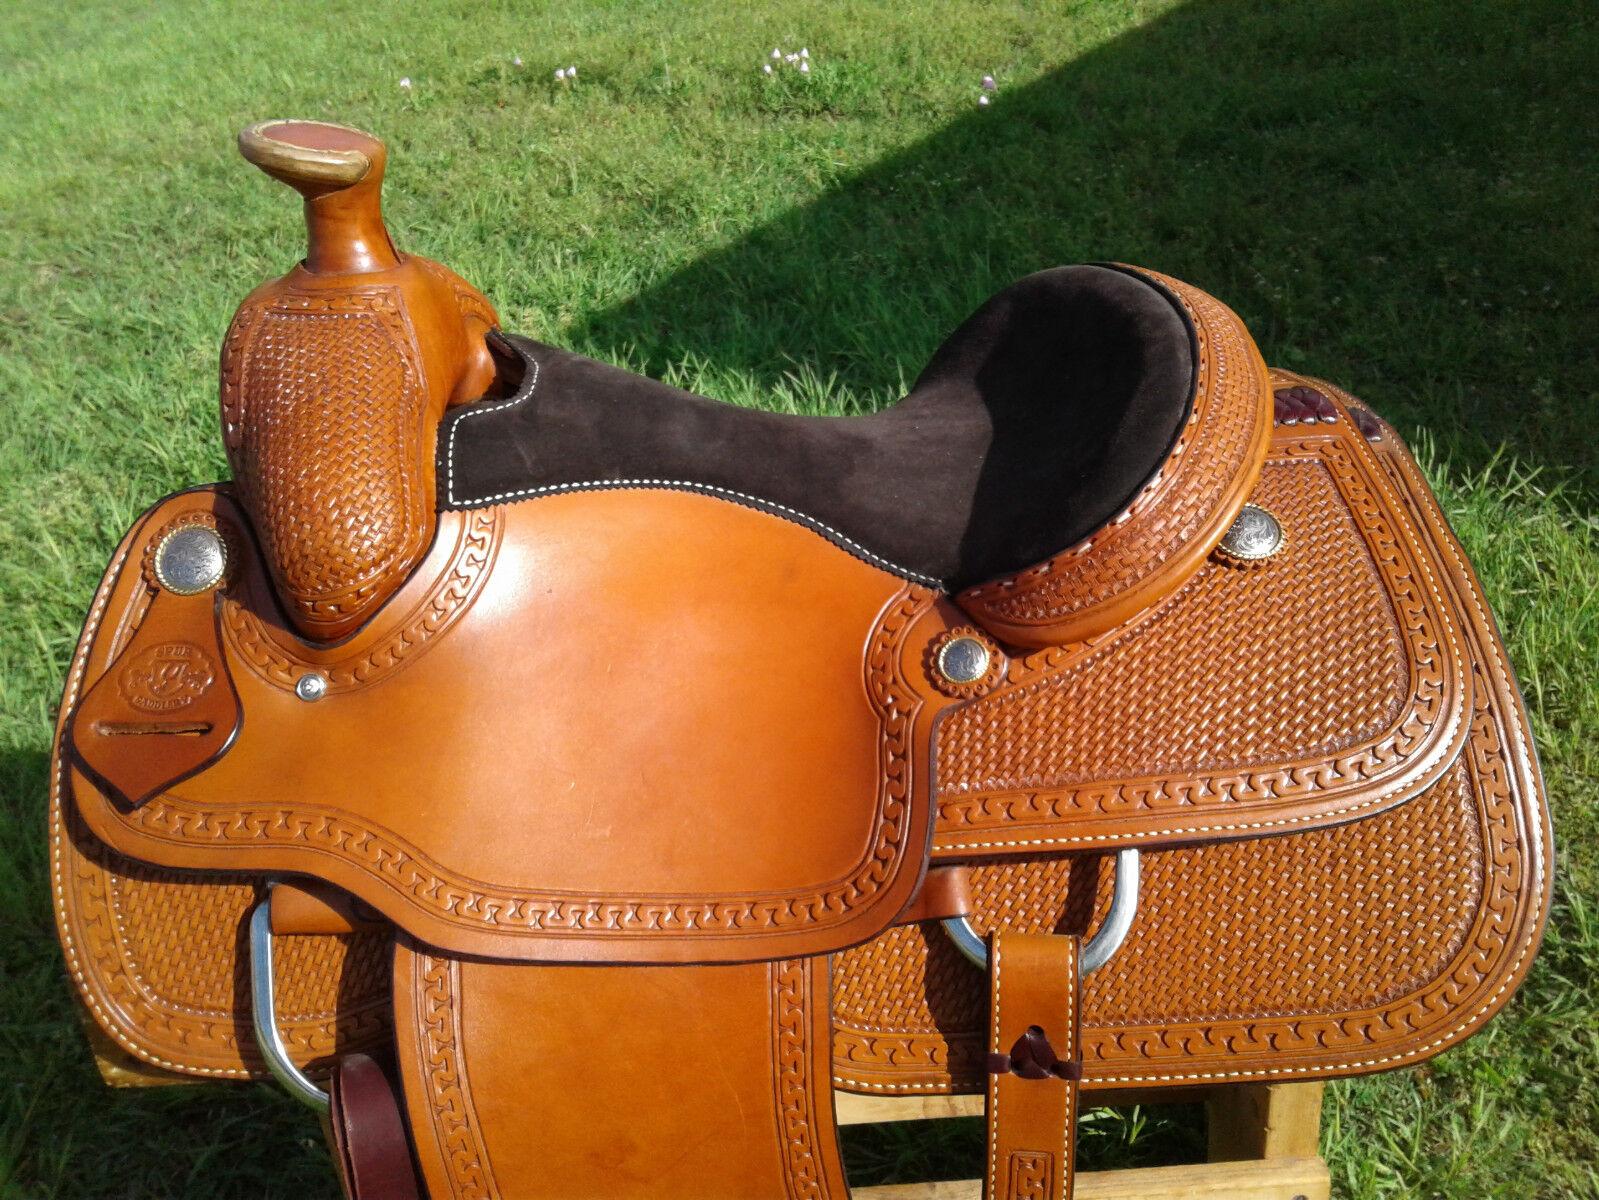 15.5  Spur  Saddlery Roping Saddle - Made in Texas  beautiful